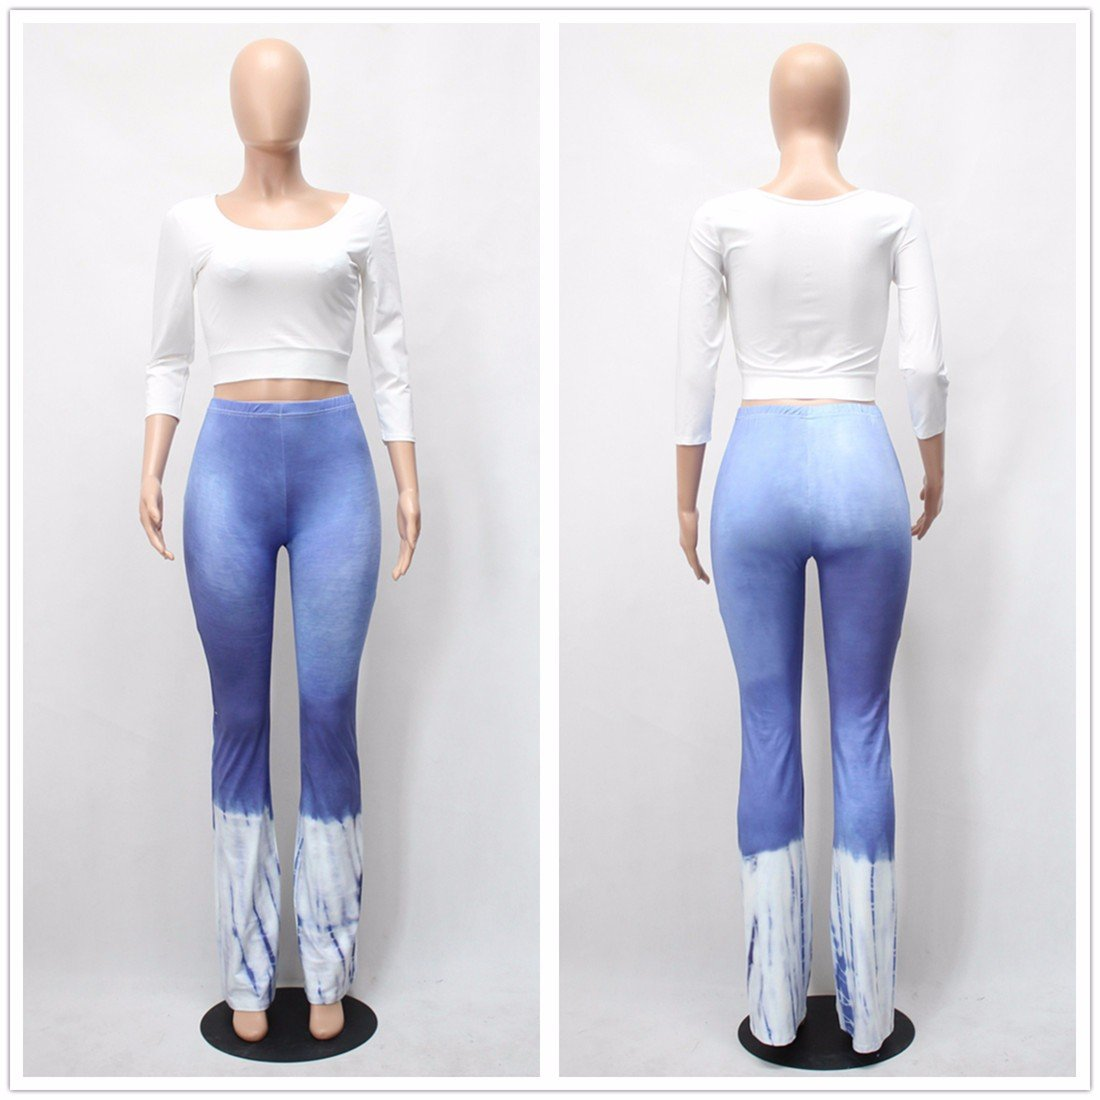 Women Crop Top Bell-Bottoms Flare Leg Long Pant Bandage High Waist Suit Tops